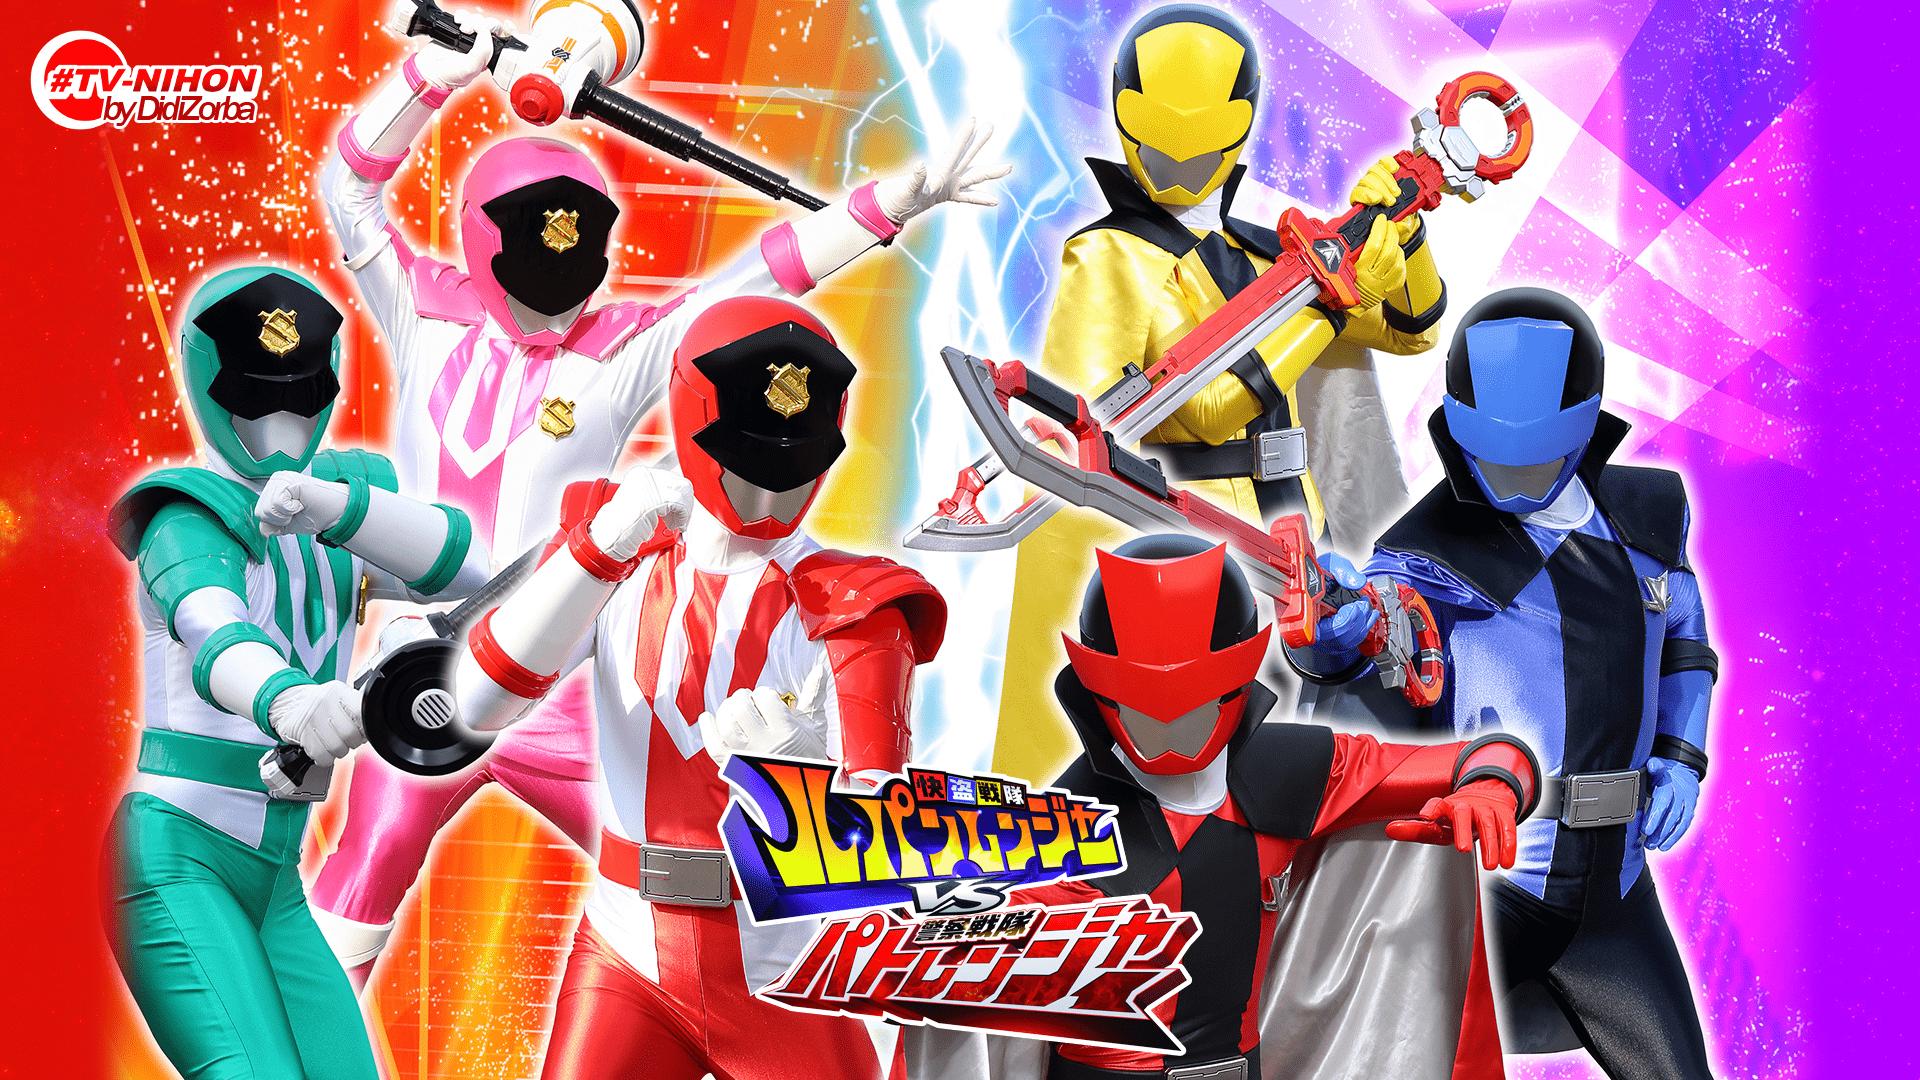 Kaitou Sentai Lupinranger Vs Keisatsu Sentai Patranger 2